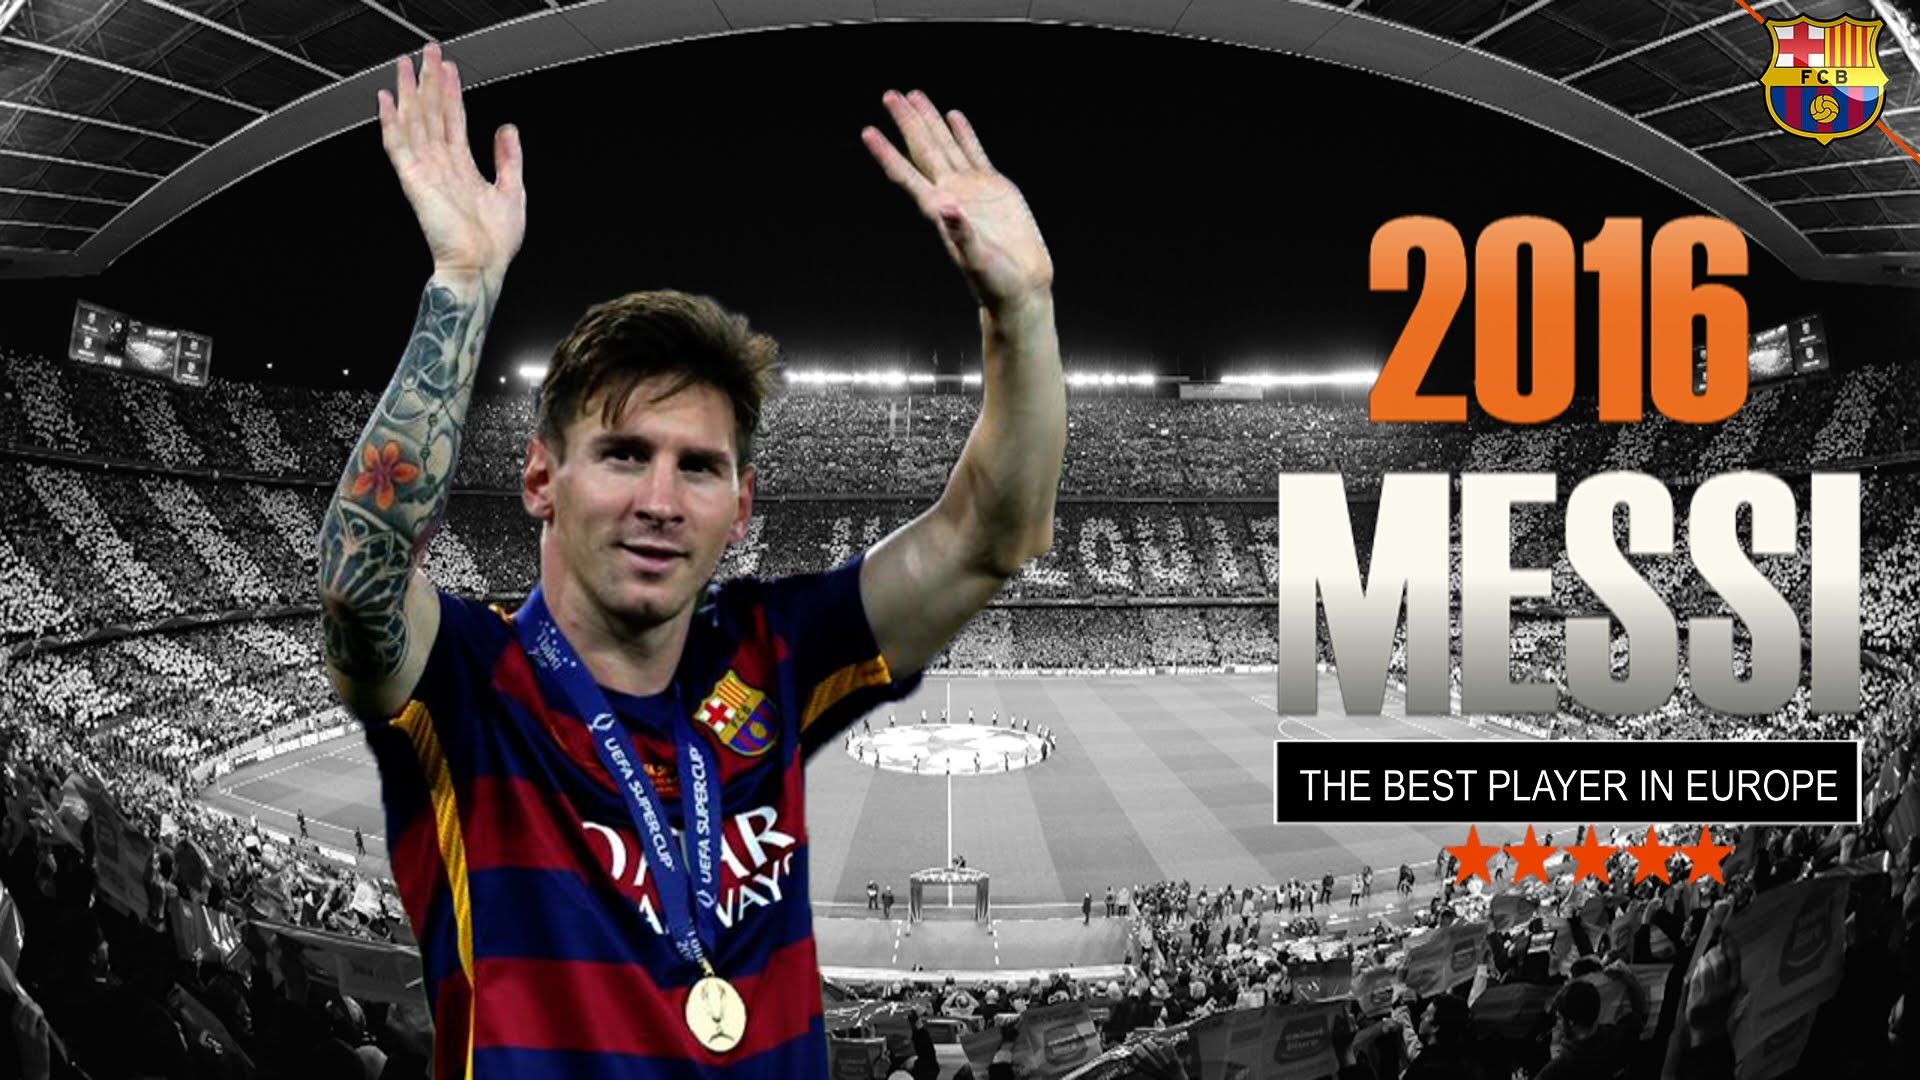 Lionel Messi 2016 Wallpaper Hd Find Best Latest Lionel Messi 2016